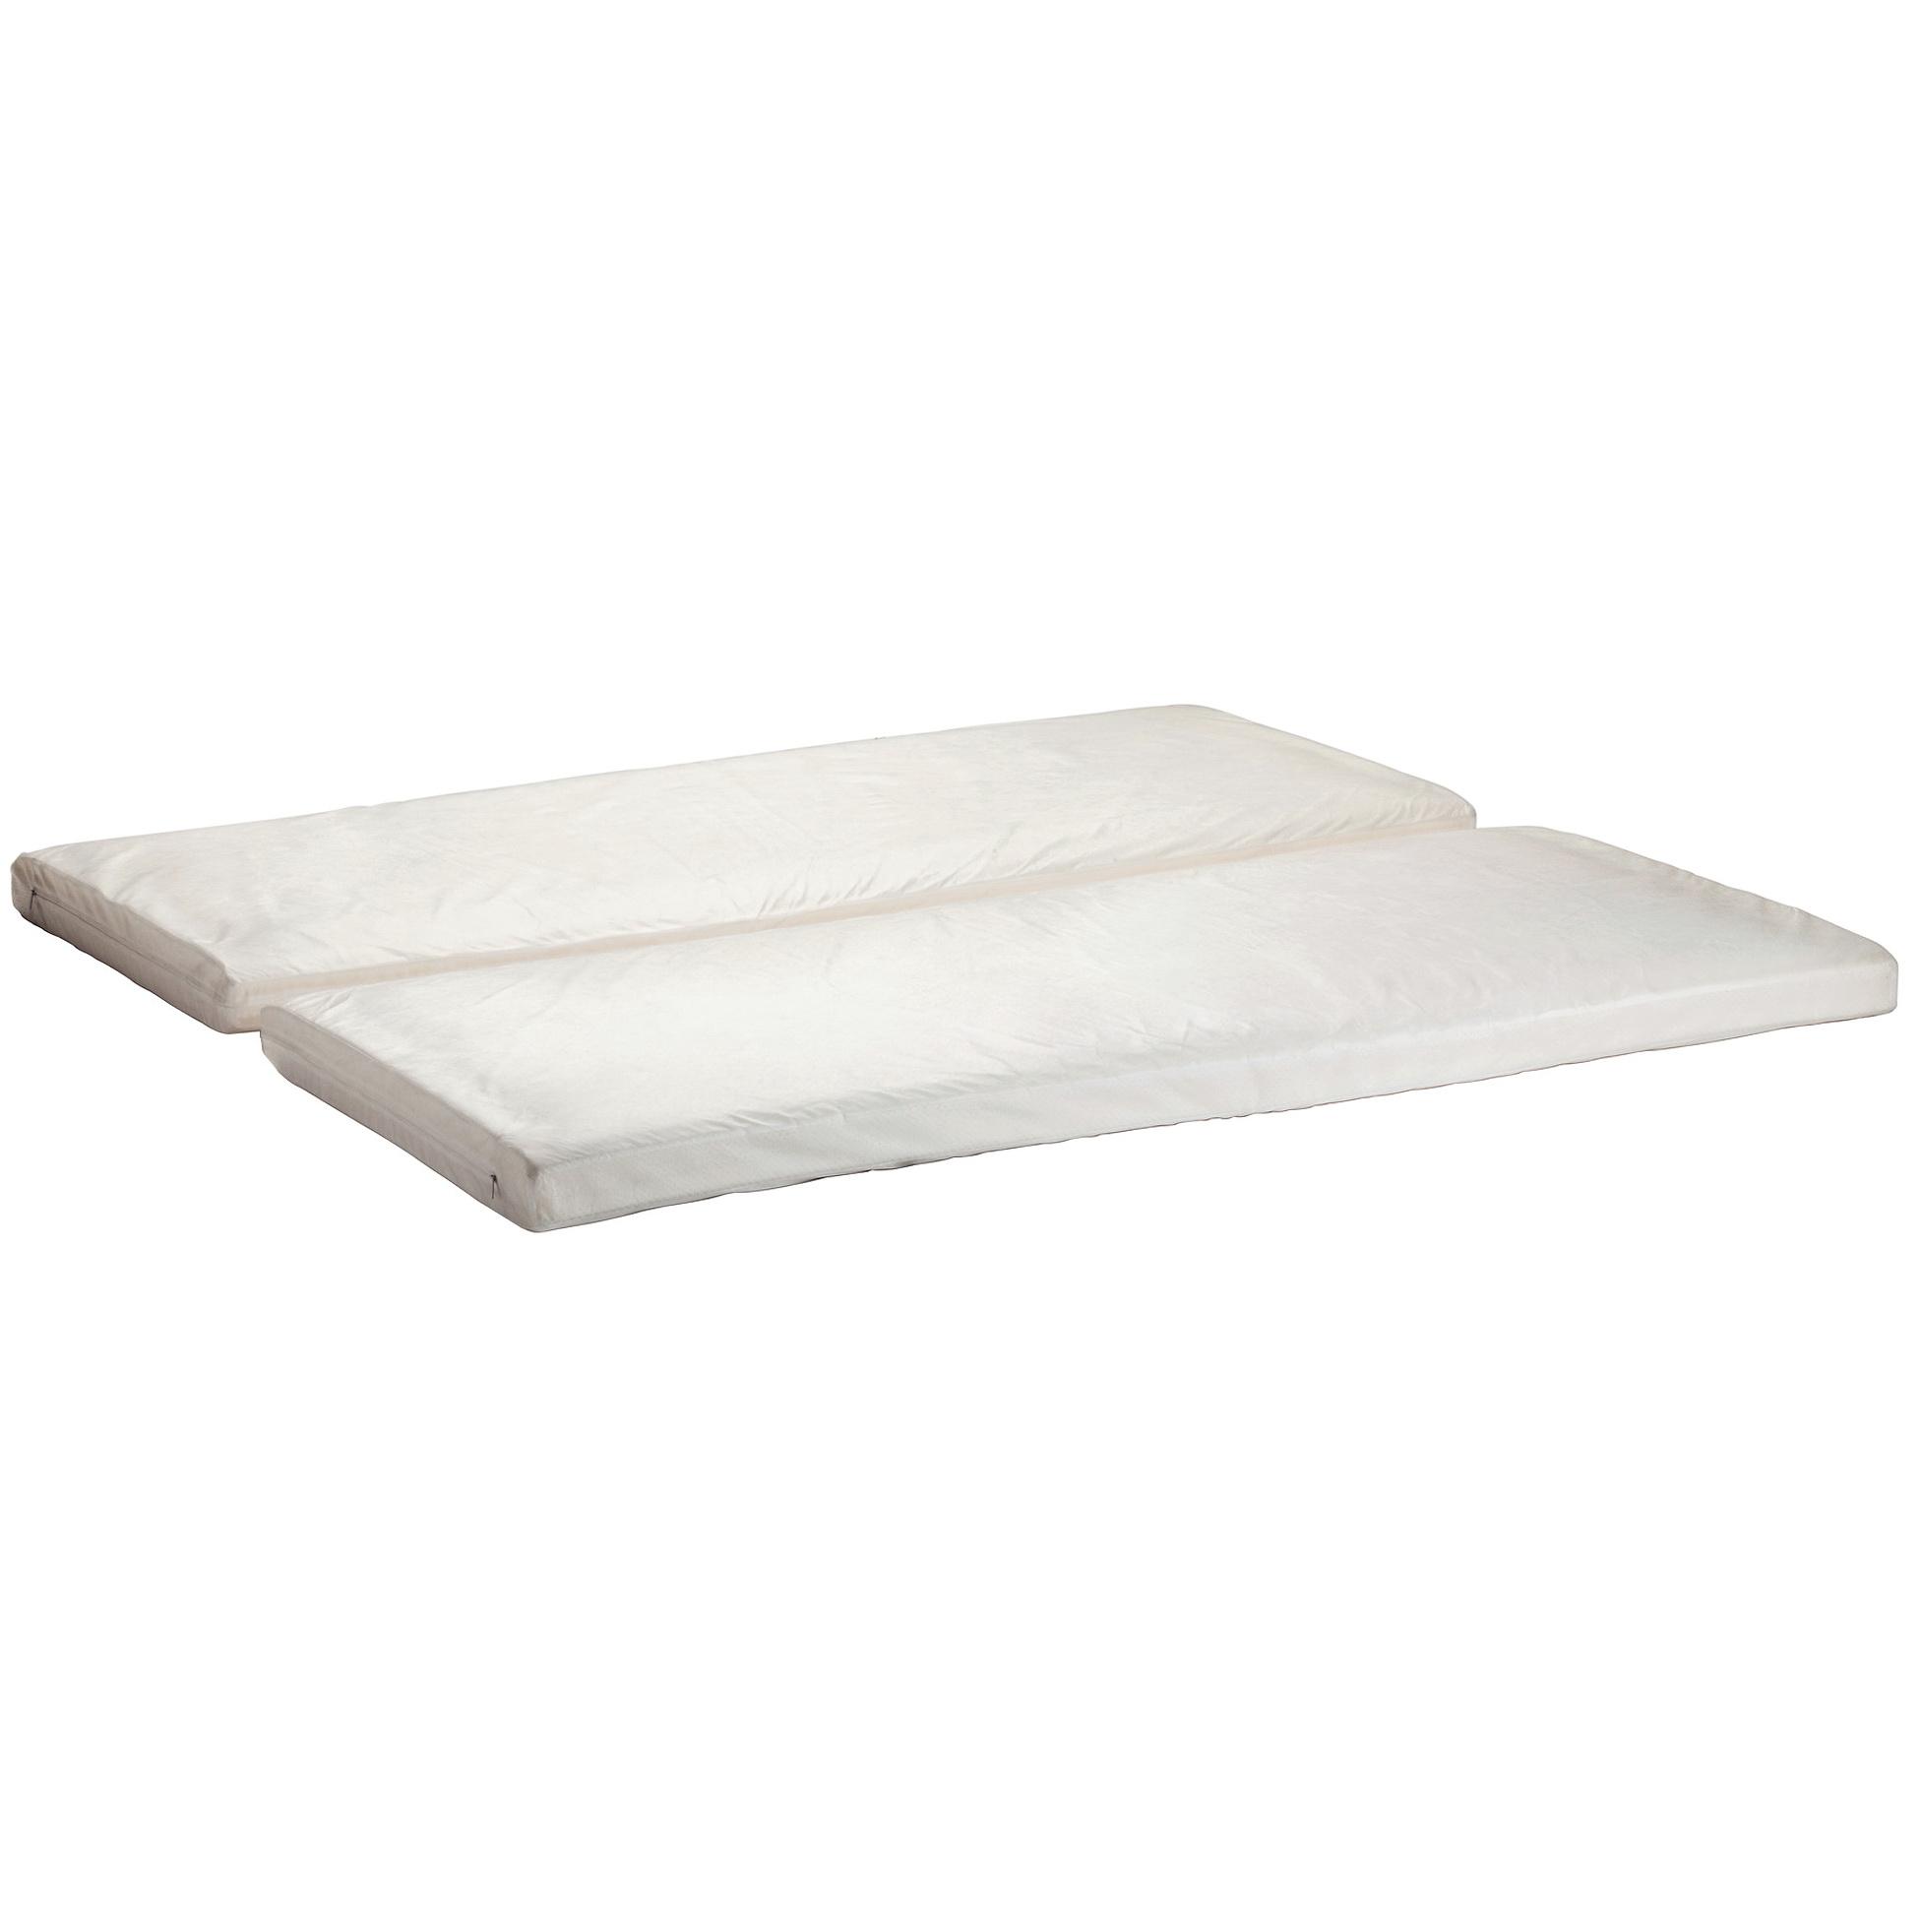 floor cushions ikea canada home design ideas. Black Bedroom Furniture Sets. Home Design Ideas